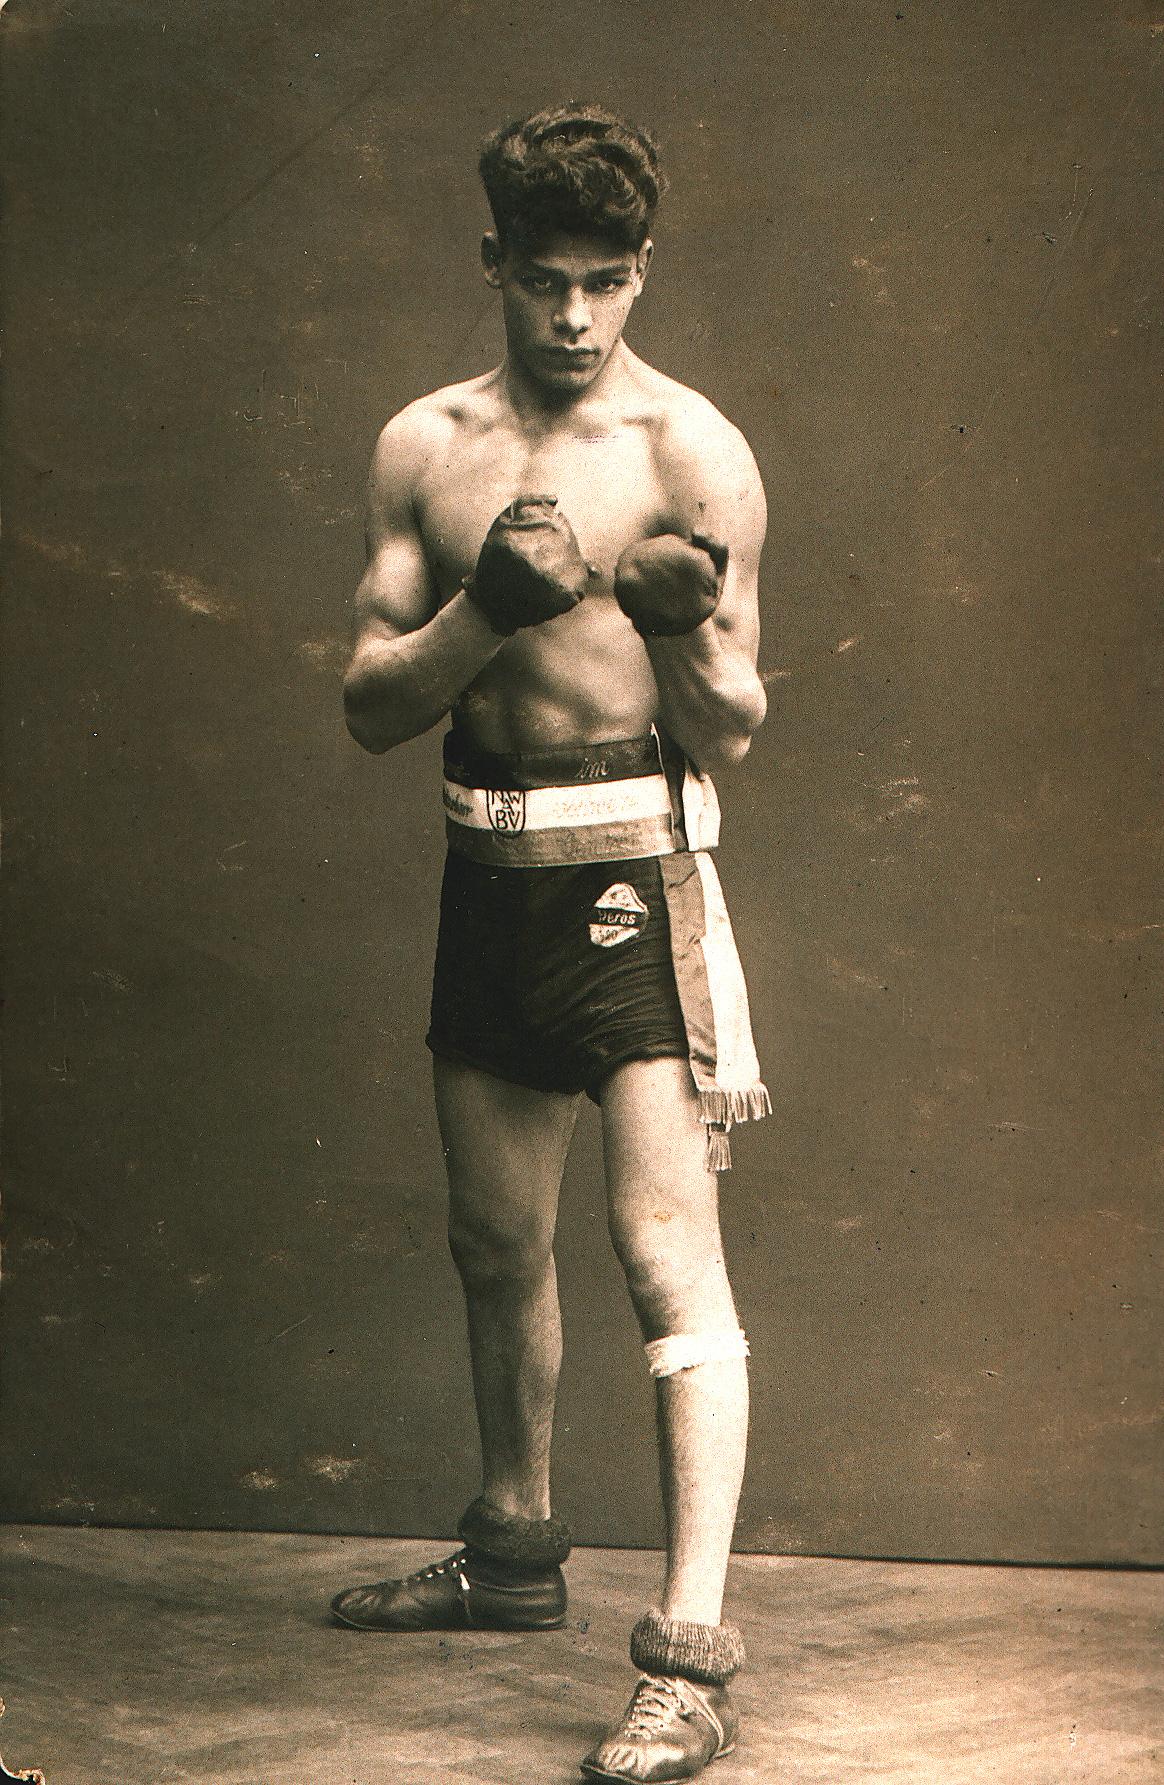 HMDT Blog: The life of Sinto boxer Johann 'Rukeli' Trollmann